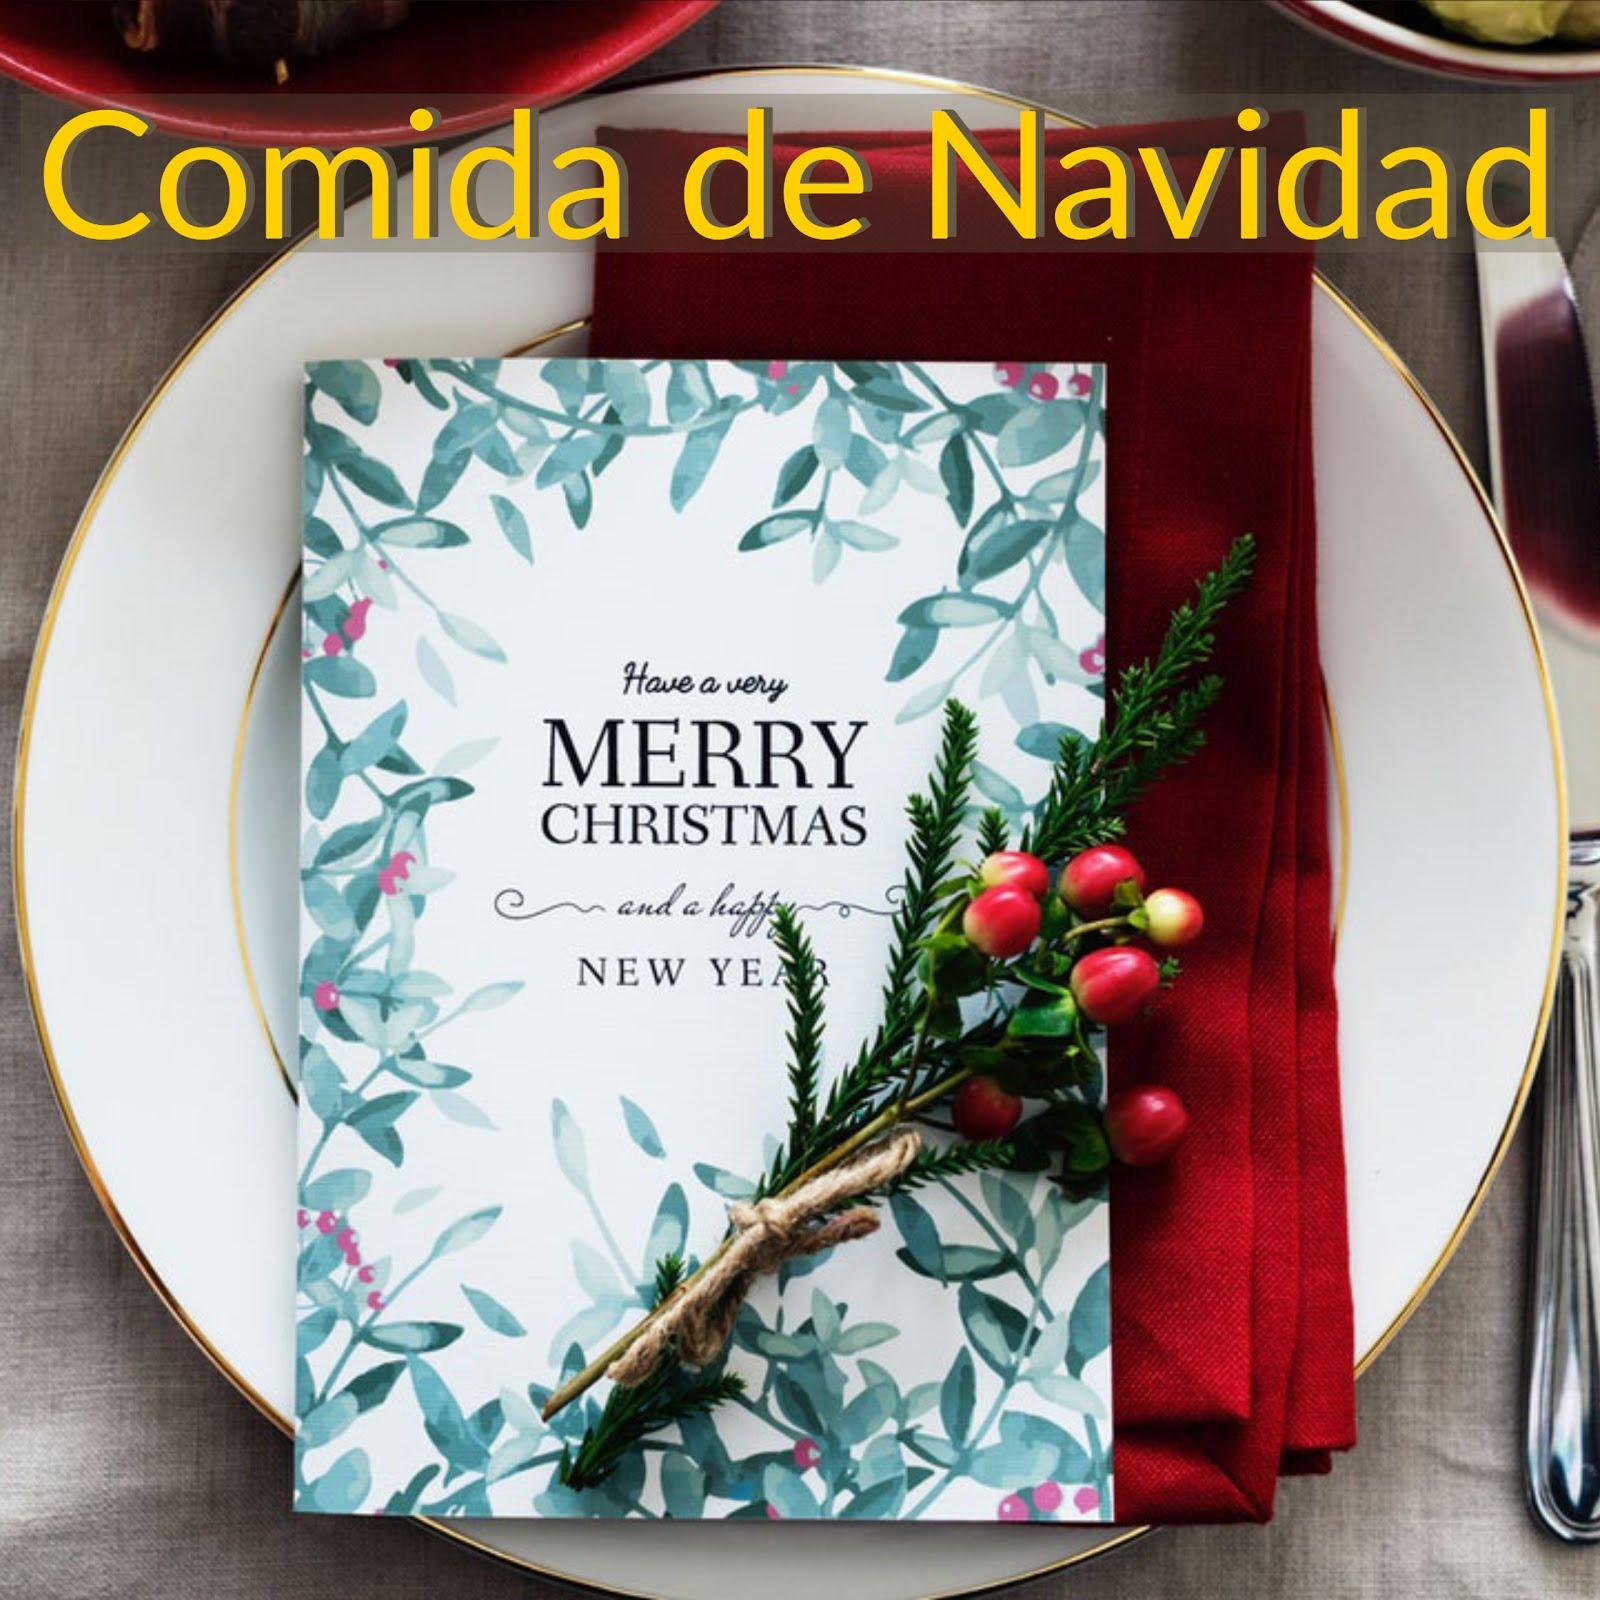 COMIDA DE NAVIDAD 15 DE DICIEMBRE